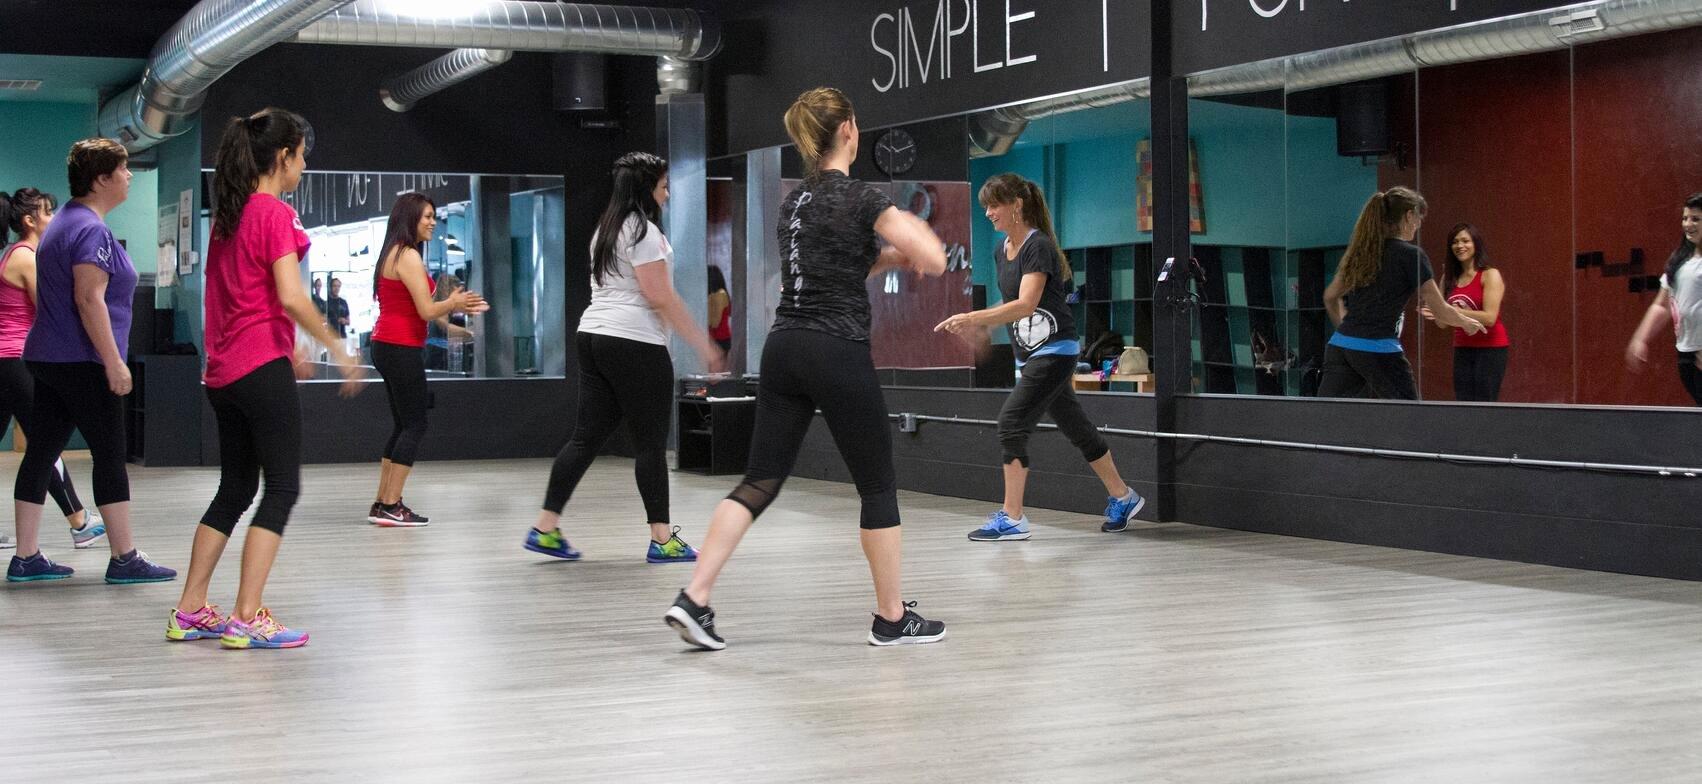 Gym Business Plan Pdf Unique Fitness Business Plan Template